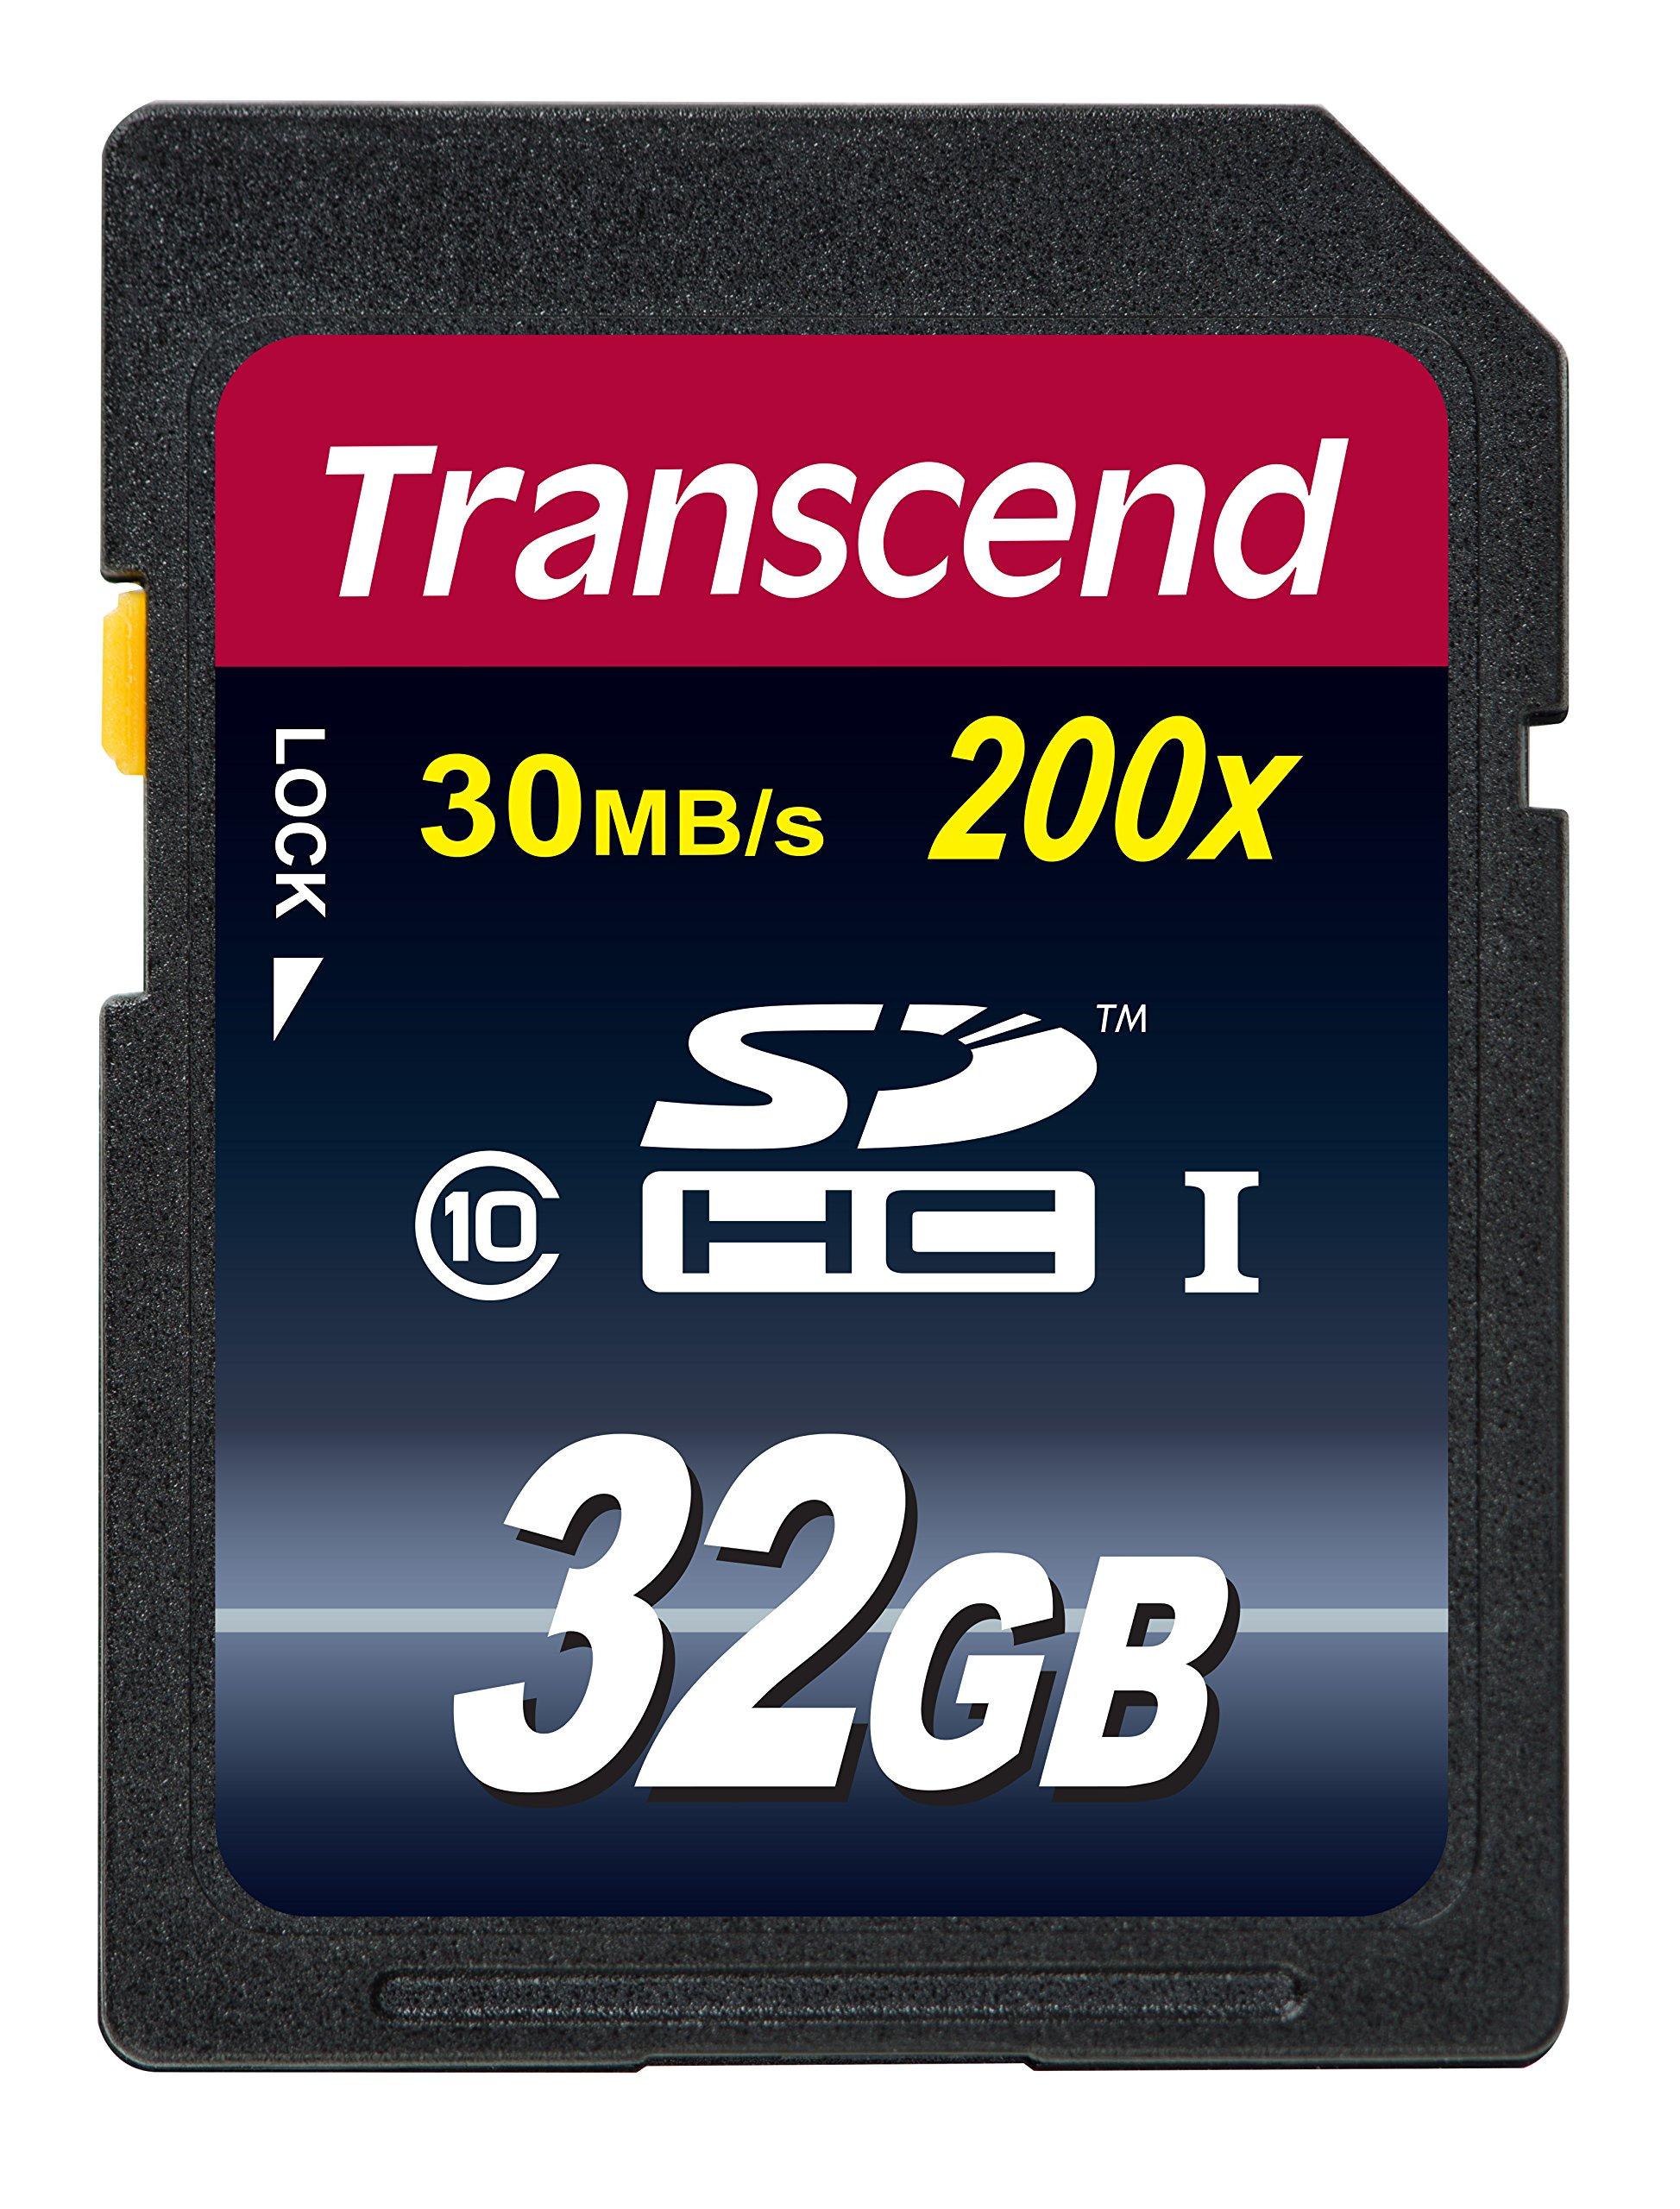 Transcend 32 GB Class 10 SDHC Flash Memory Card (TS32GSDHC10E) by Transcend